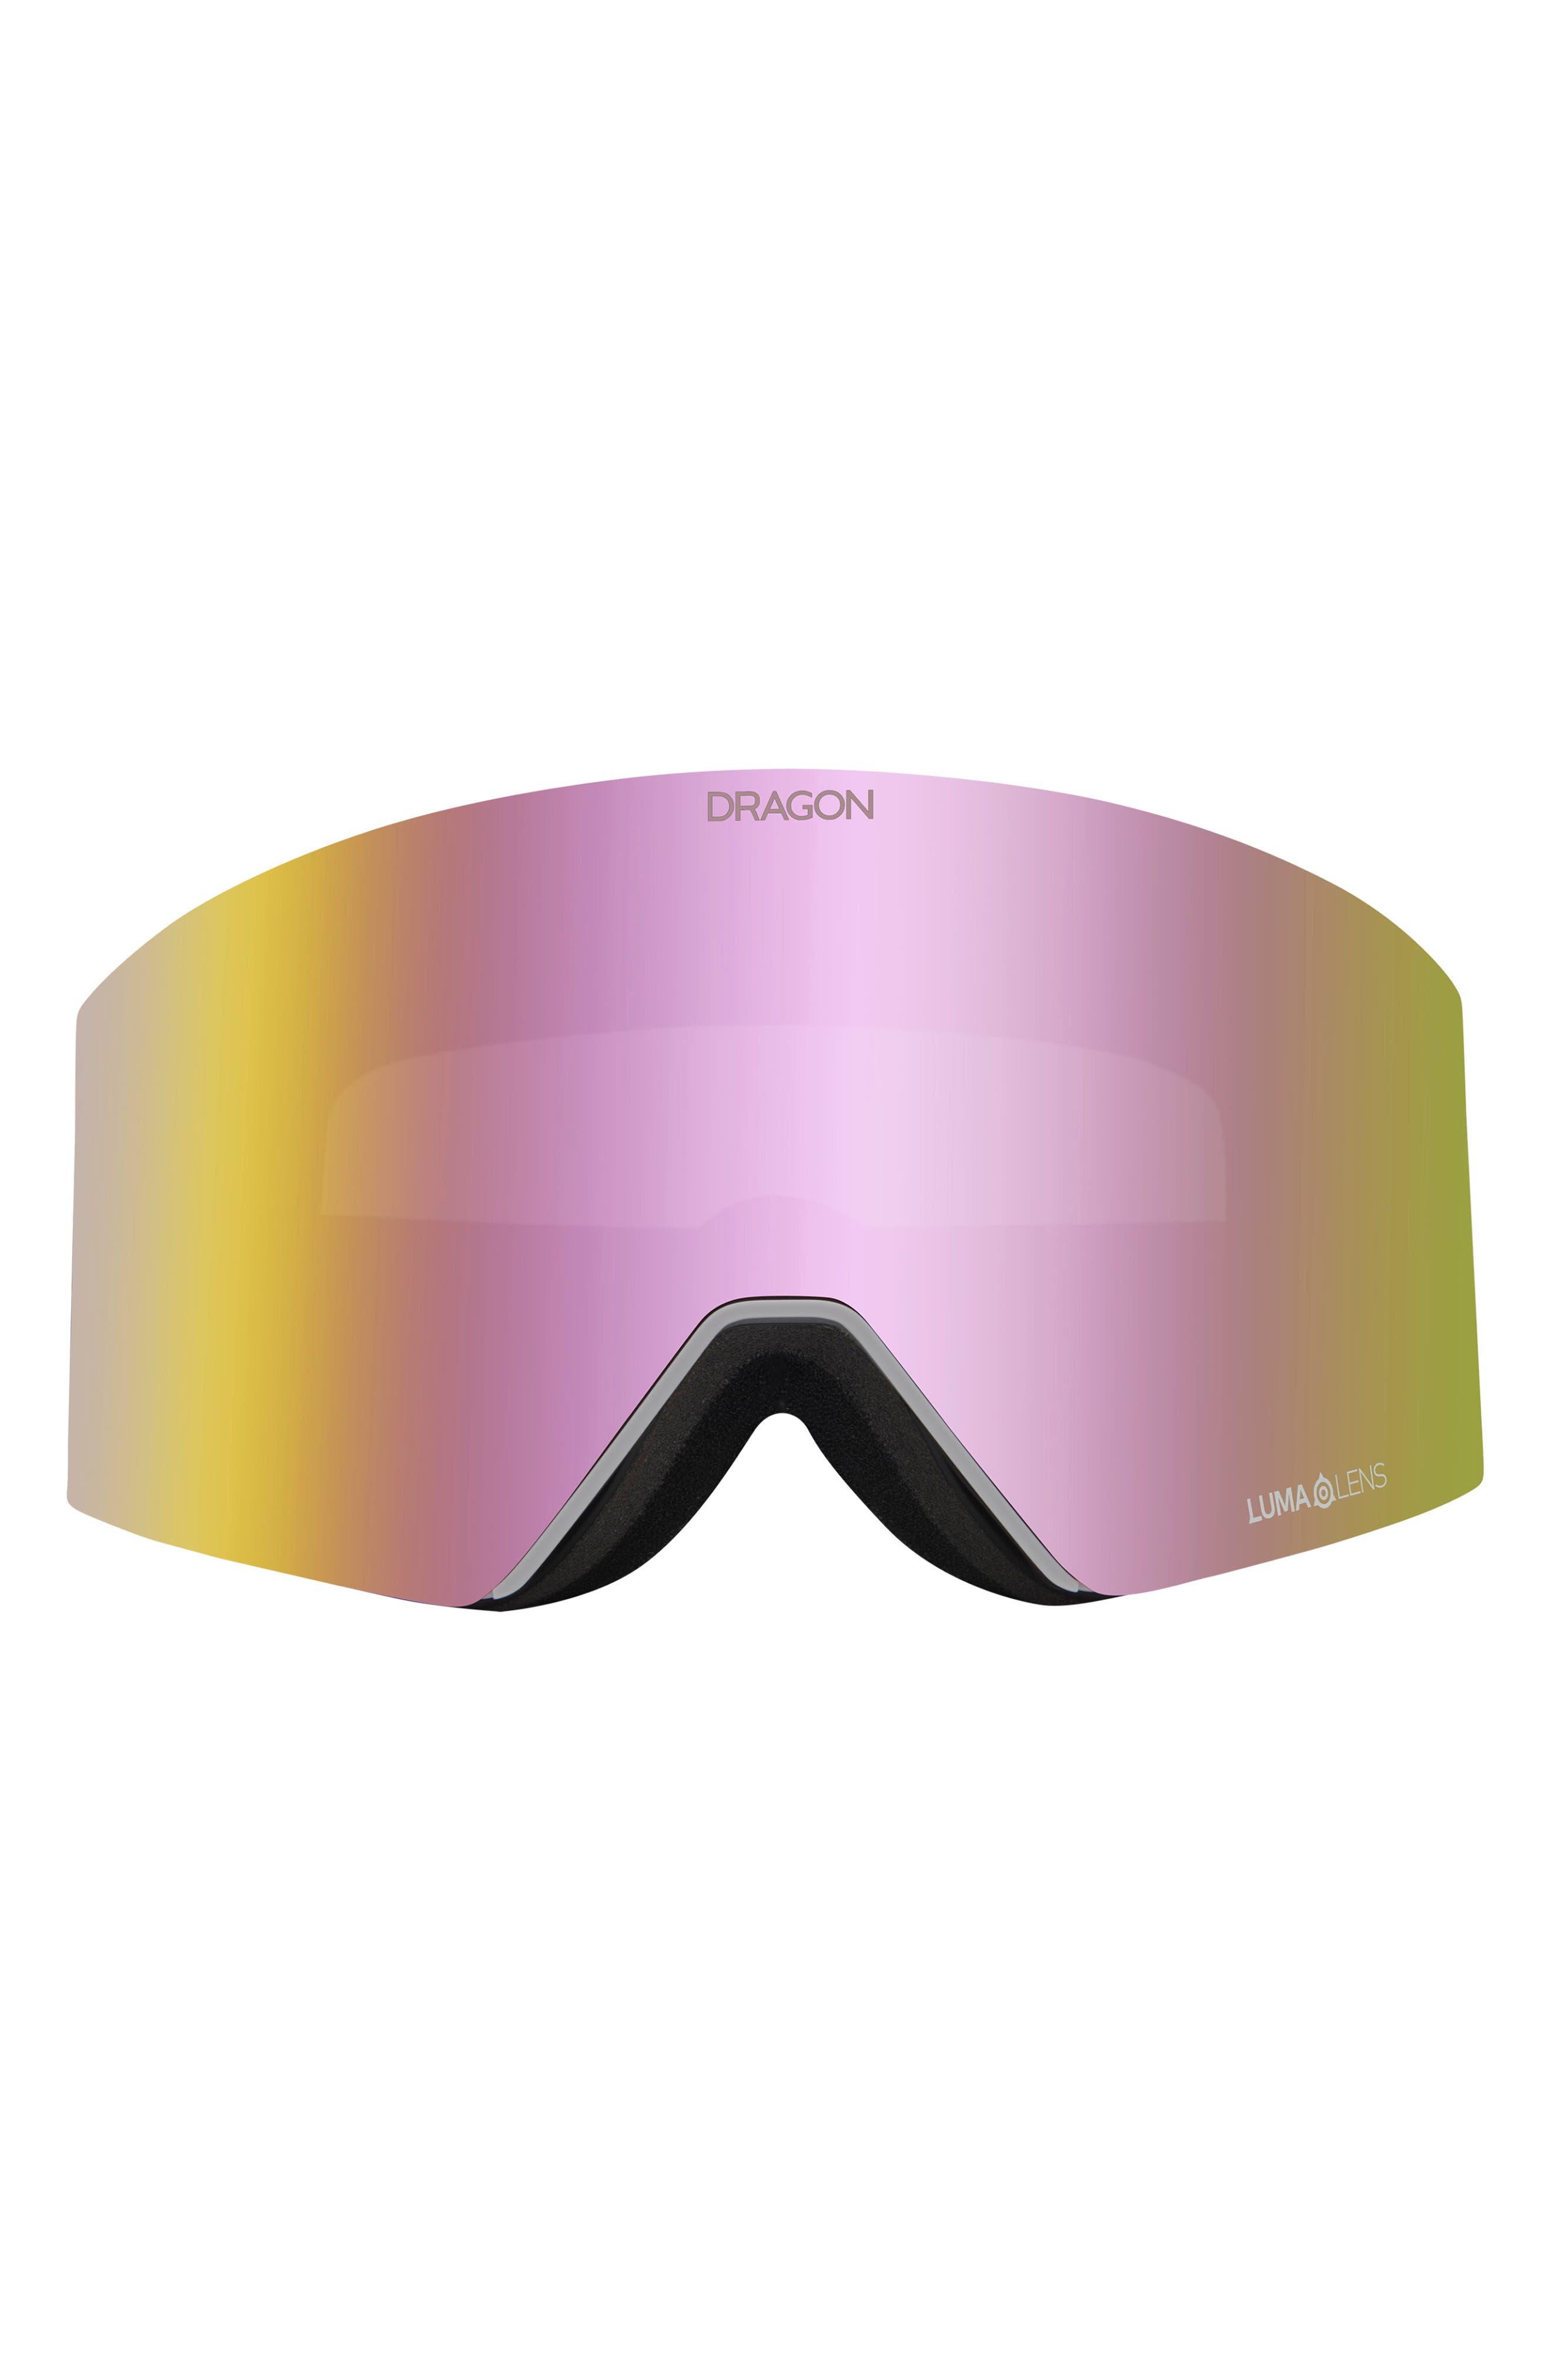 Rvx Otg 76mm Snow Goggles With Bonus Lens